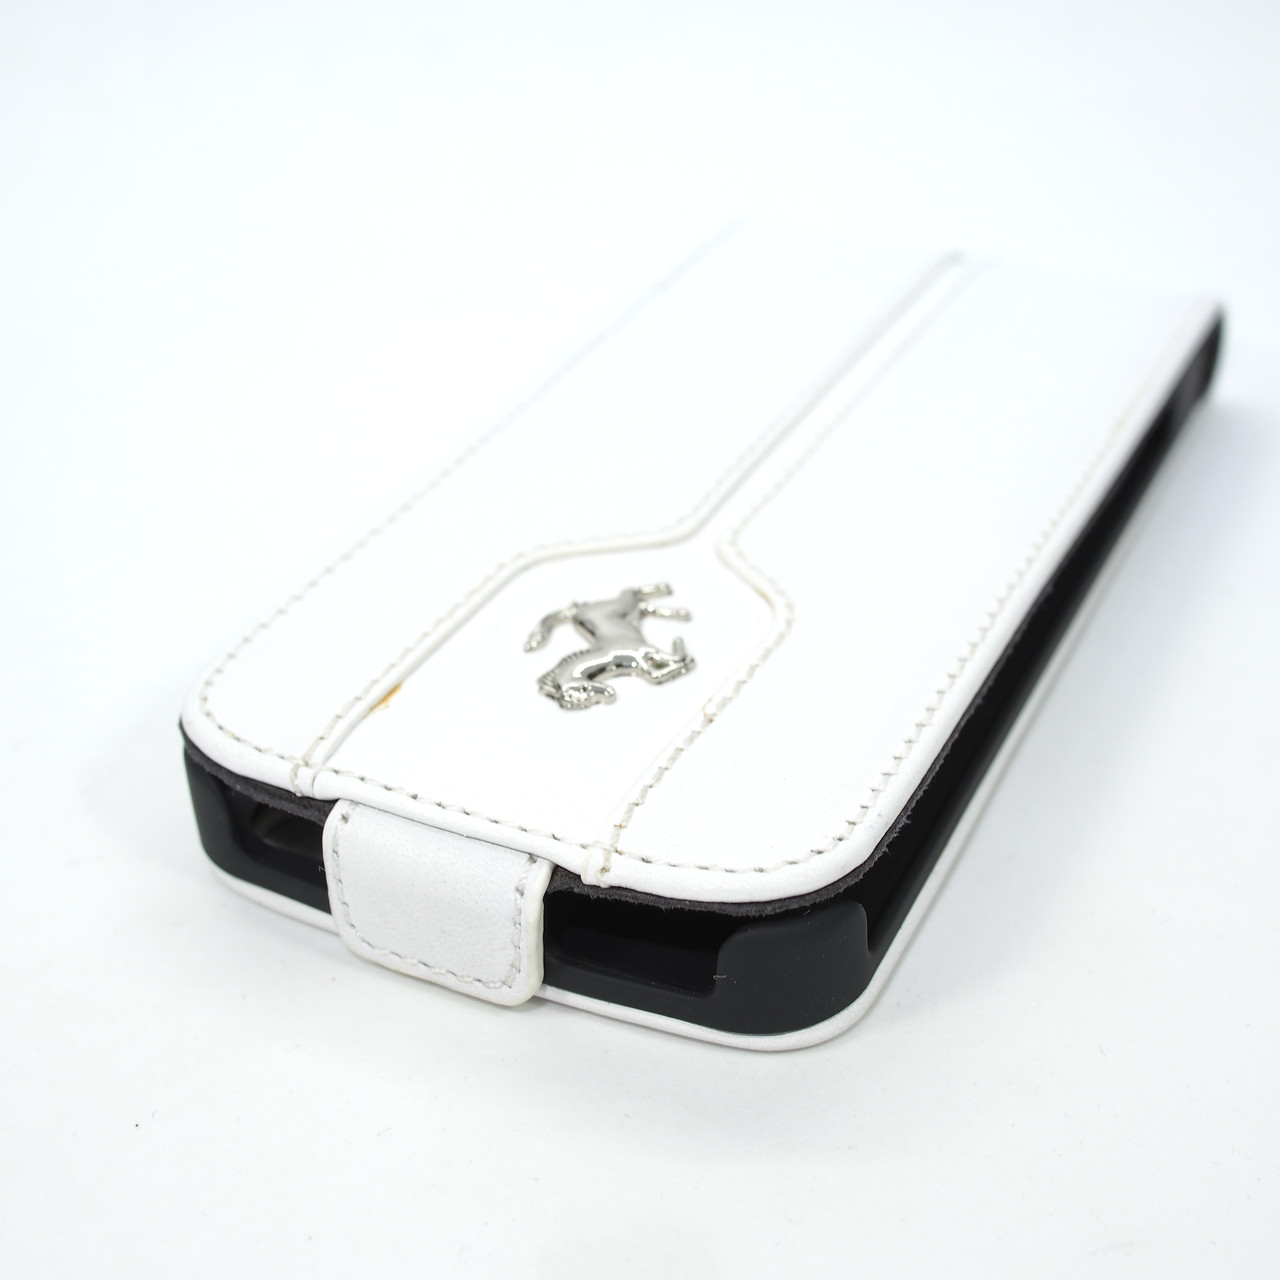 Чехол Ferrari Leather Flip Montecarlo iPhone 5s SE white Apple Для телефона